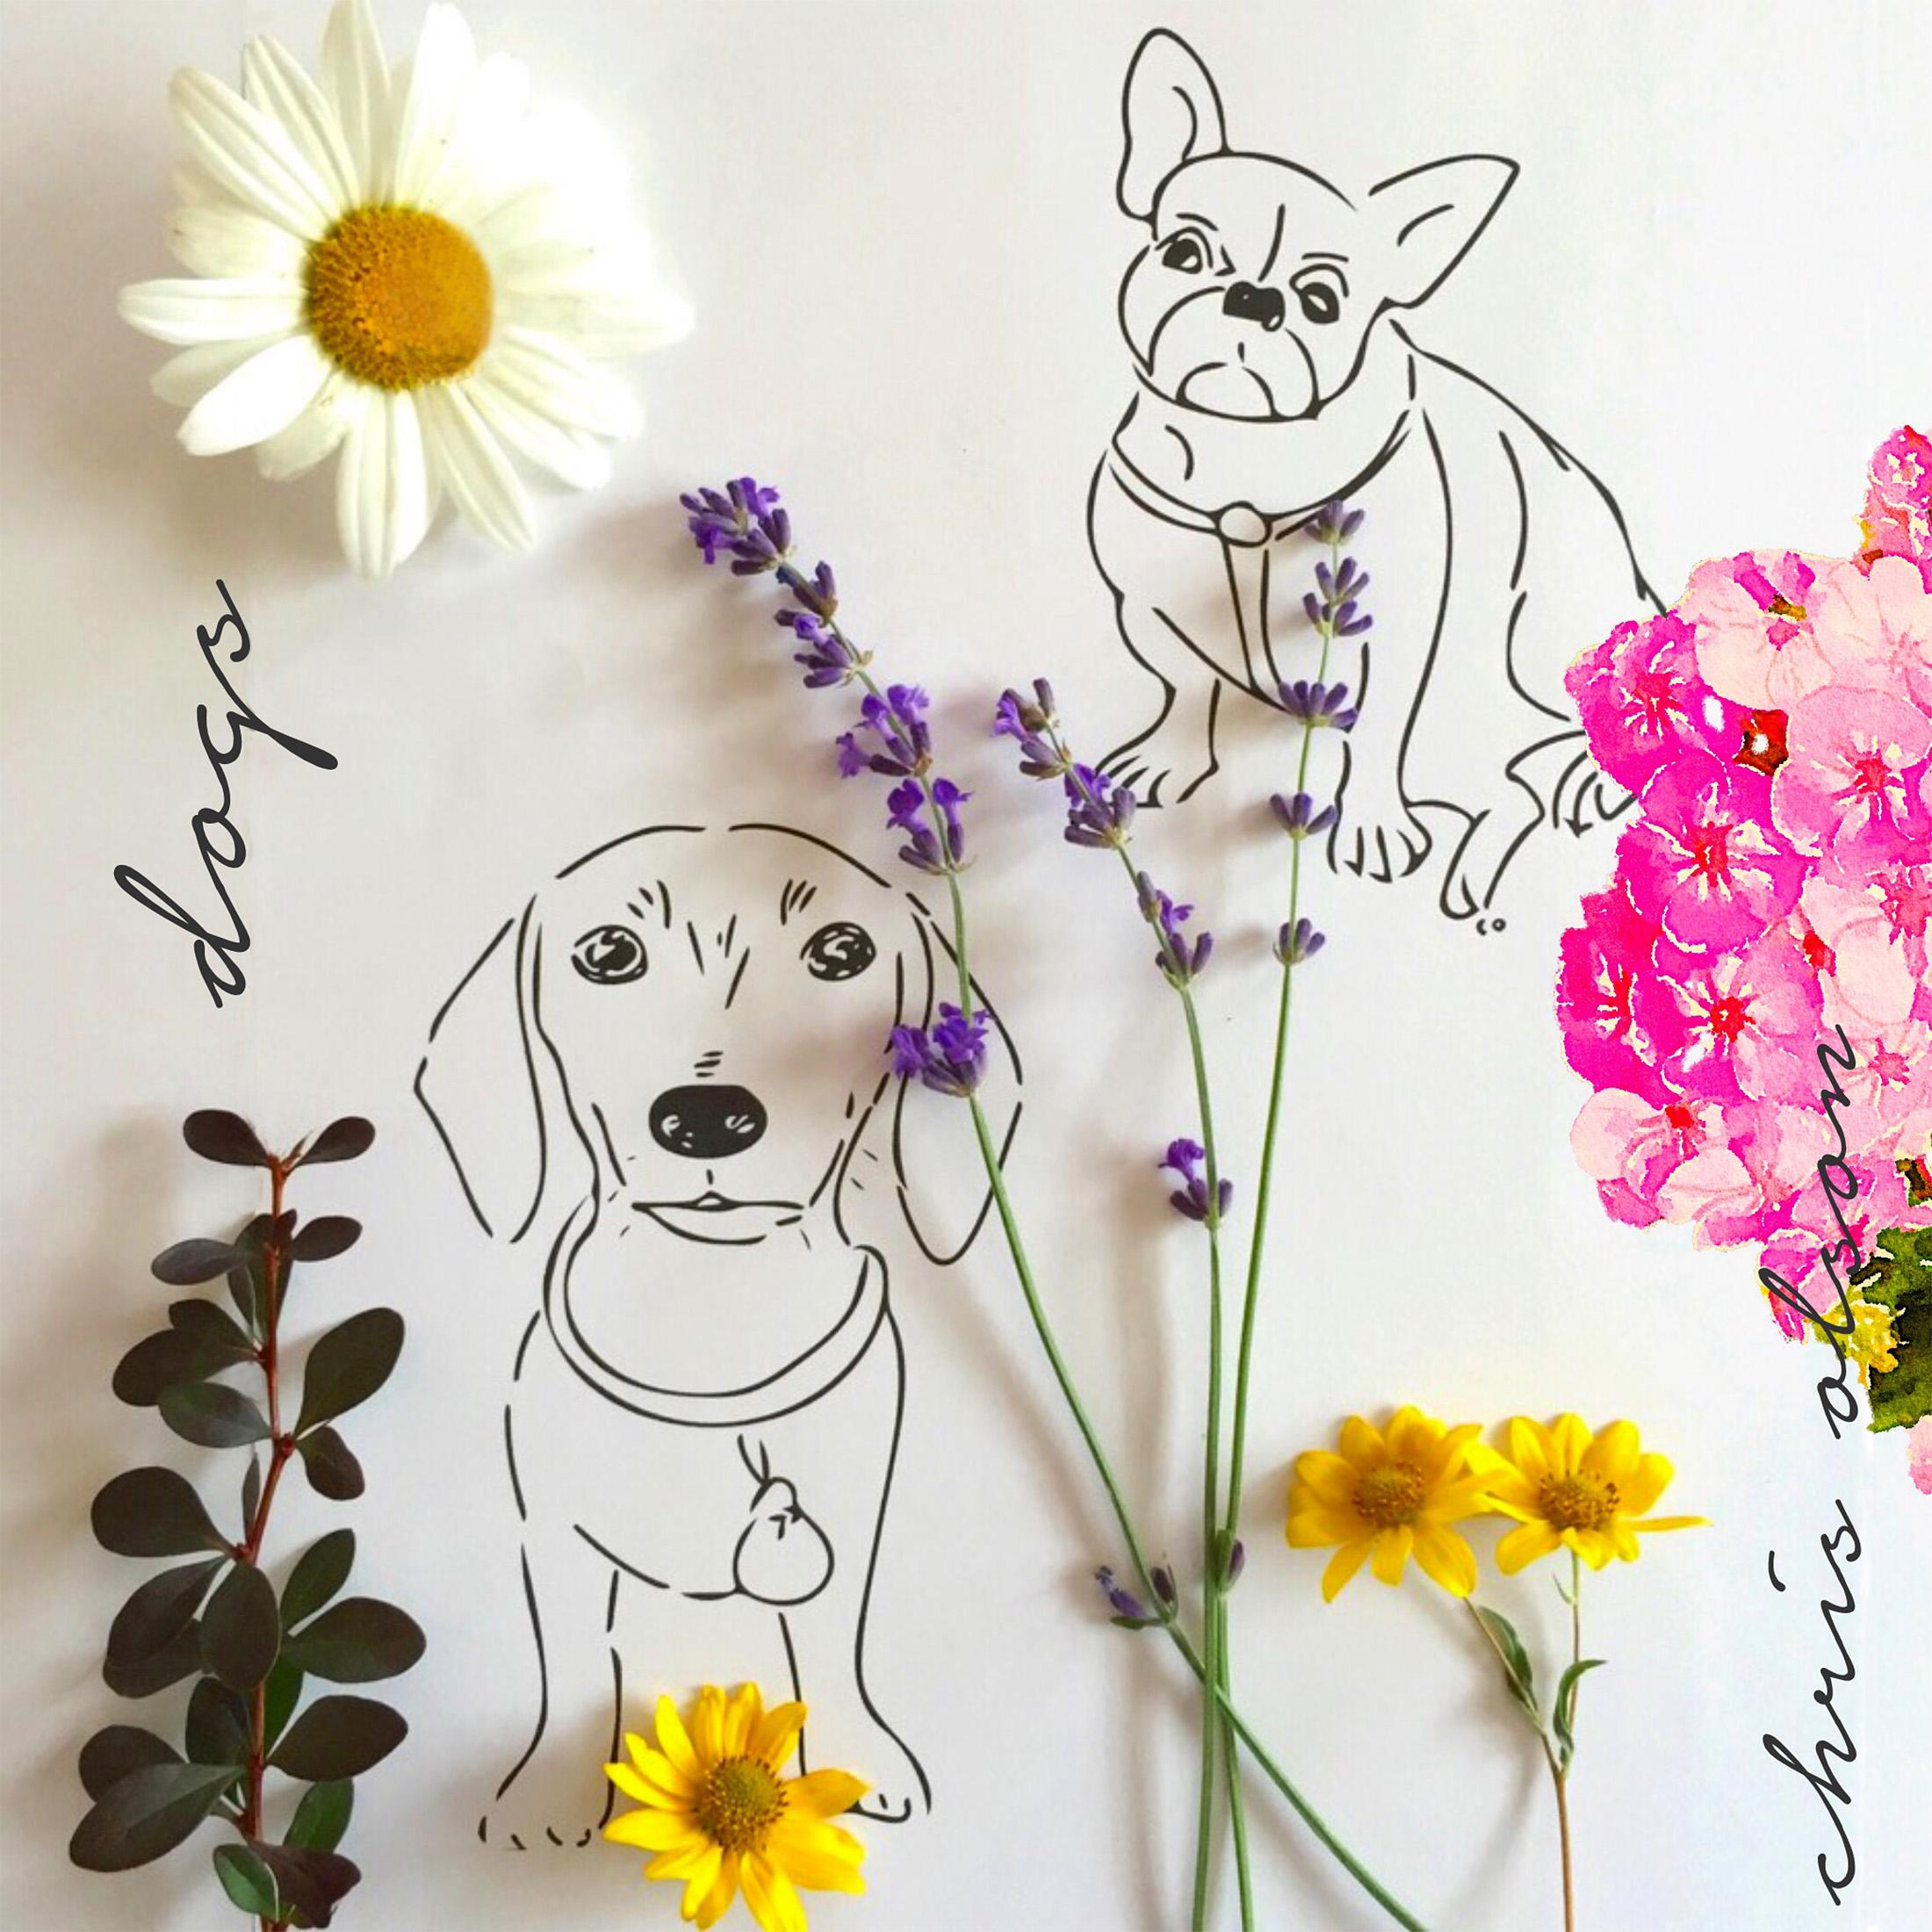 Dachshund and French Bulldog art by Chris Olson